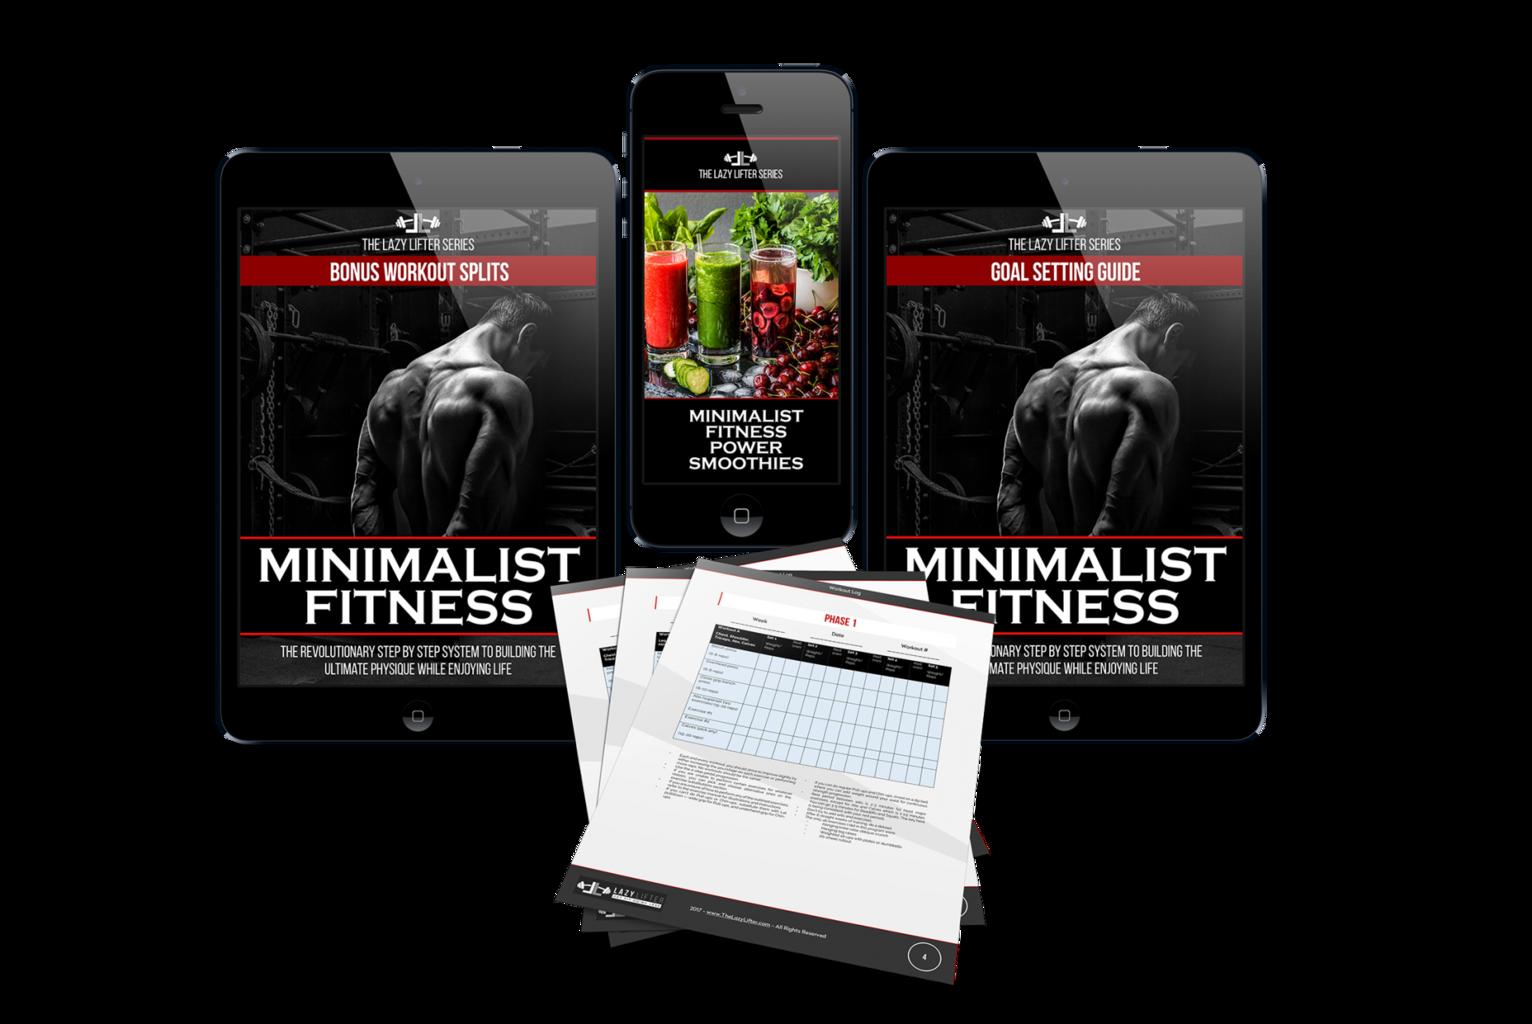 Minimalist Fitness extras